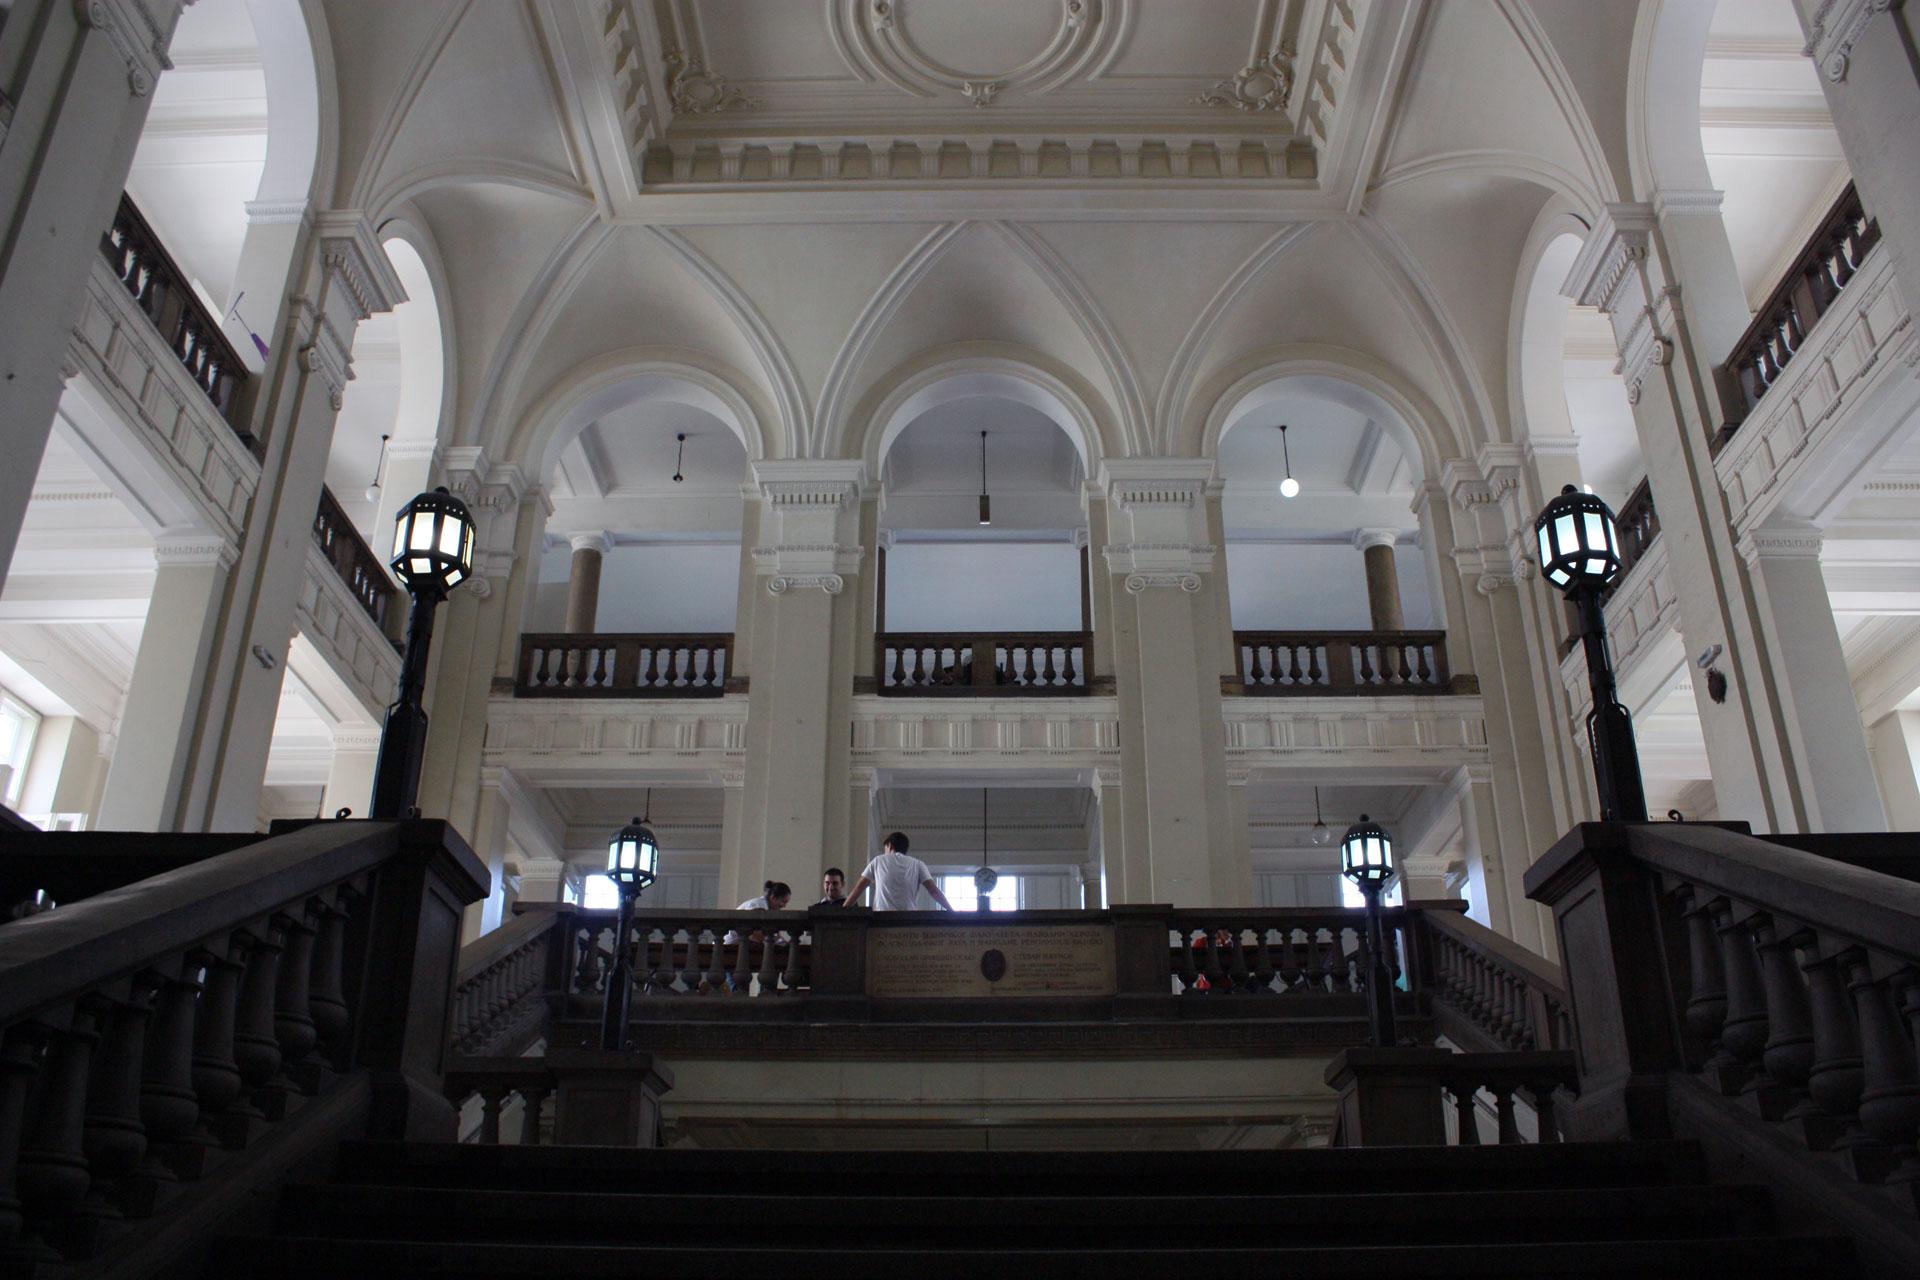 Aula arhitektonskog fakulteta